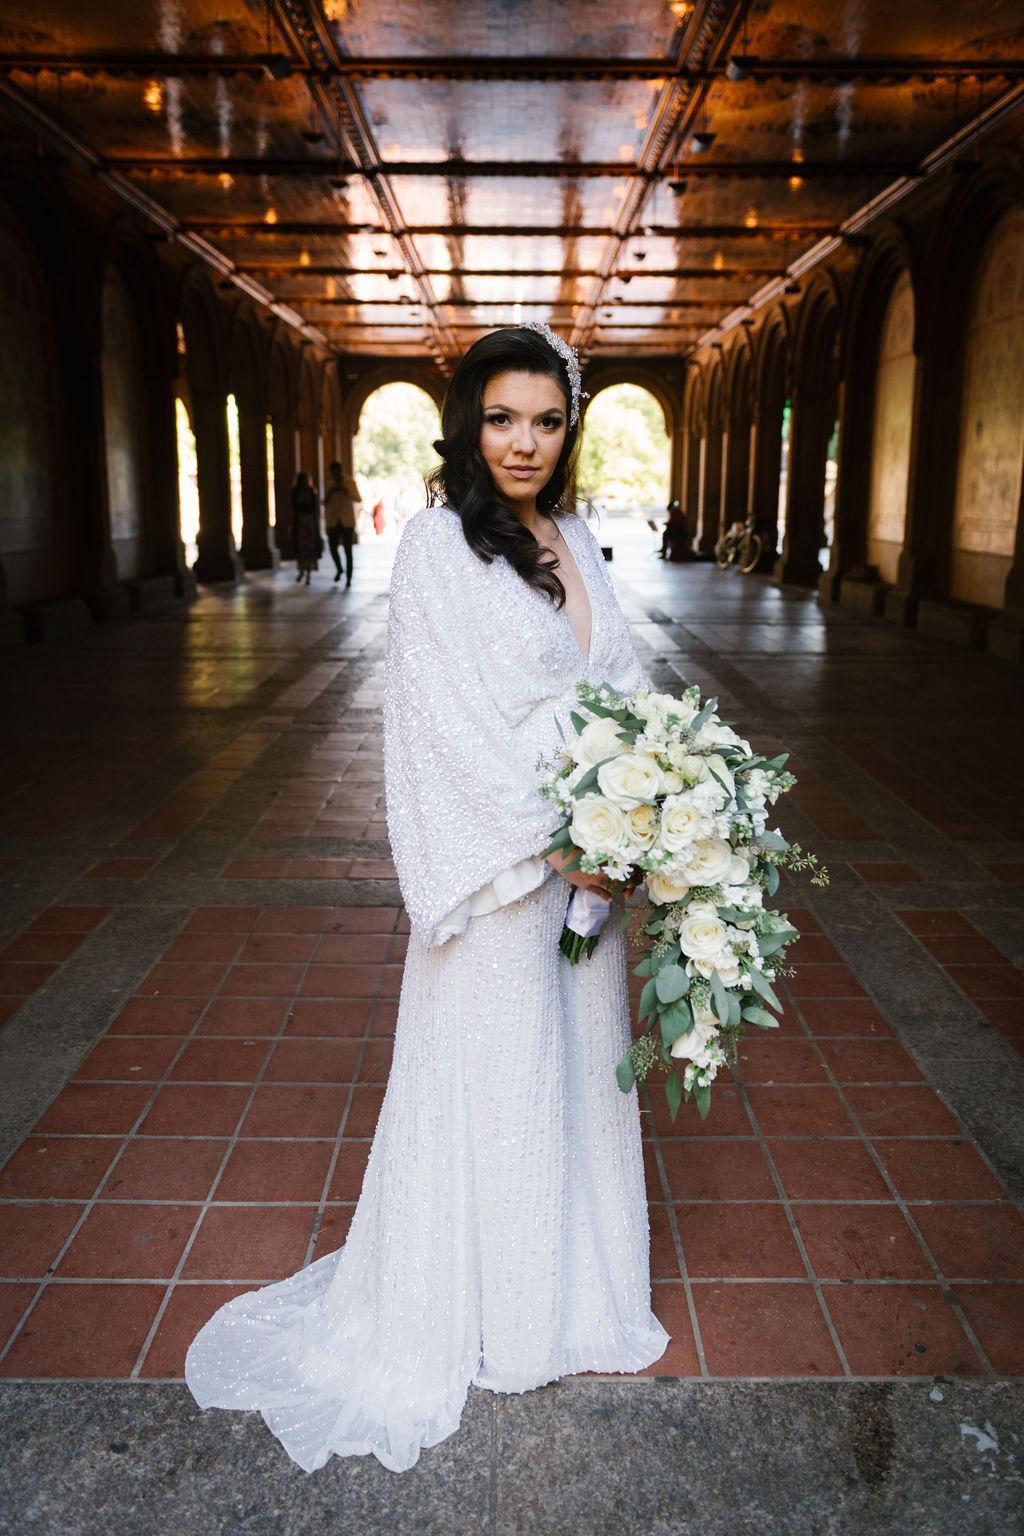 Central Park Micro Wedding-Everly Studios-03